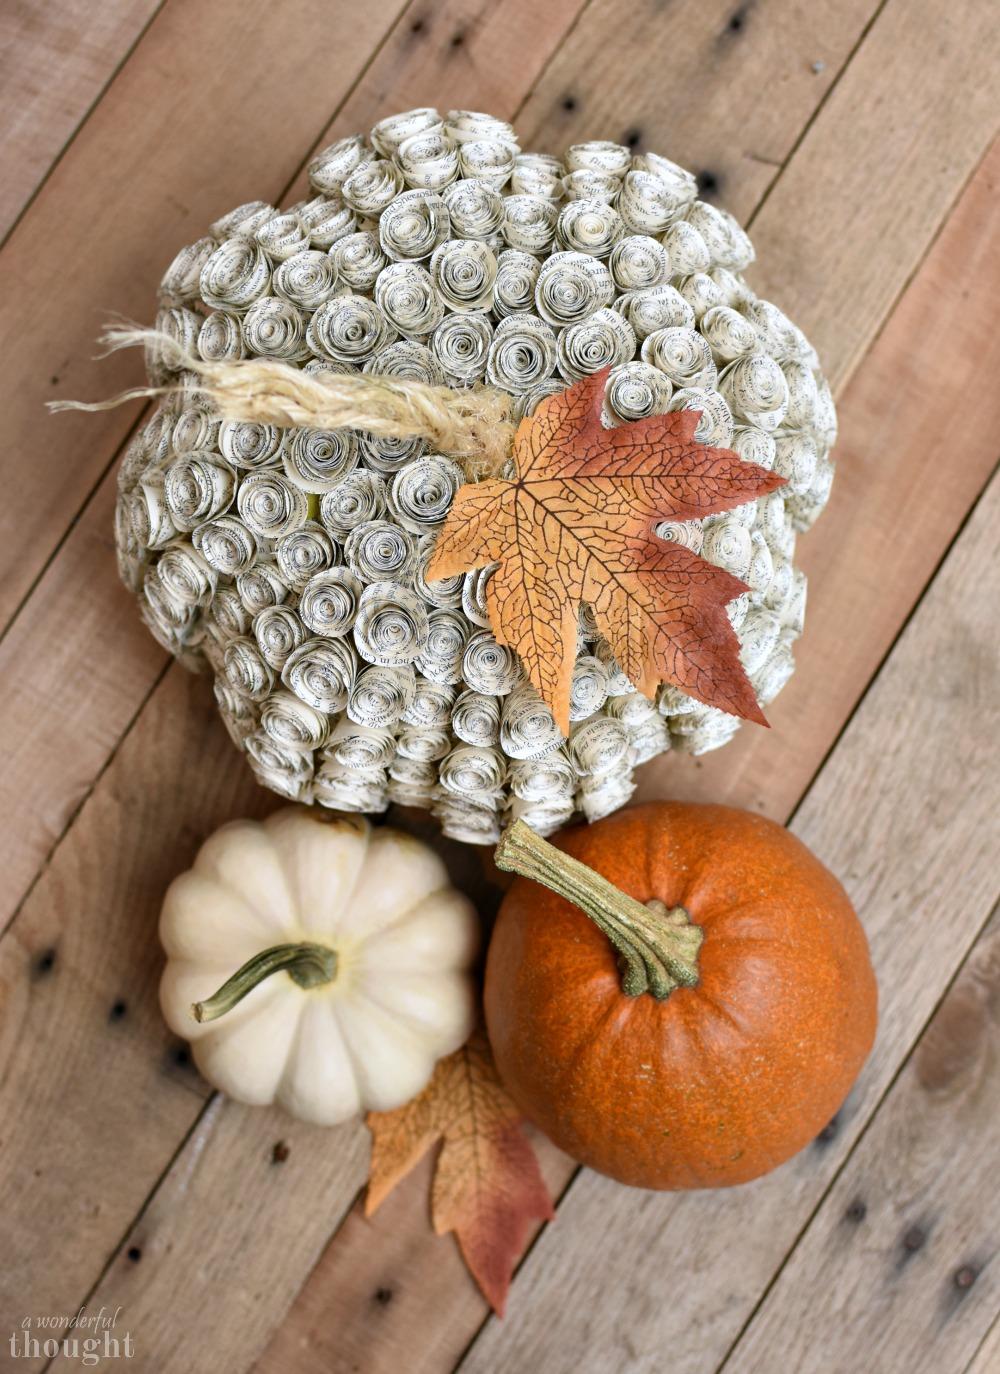 Book Page Rose Pumpkin DIY #diypumpkin #pumpkinmakeover #fallcraft #awonderfulthought.com